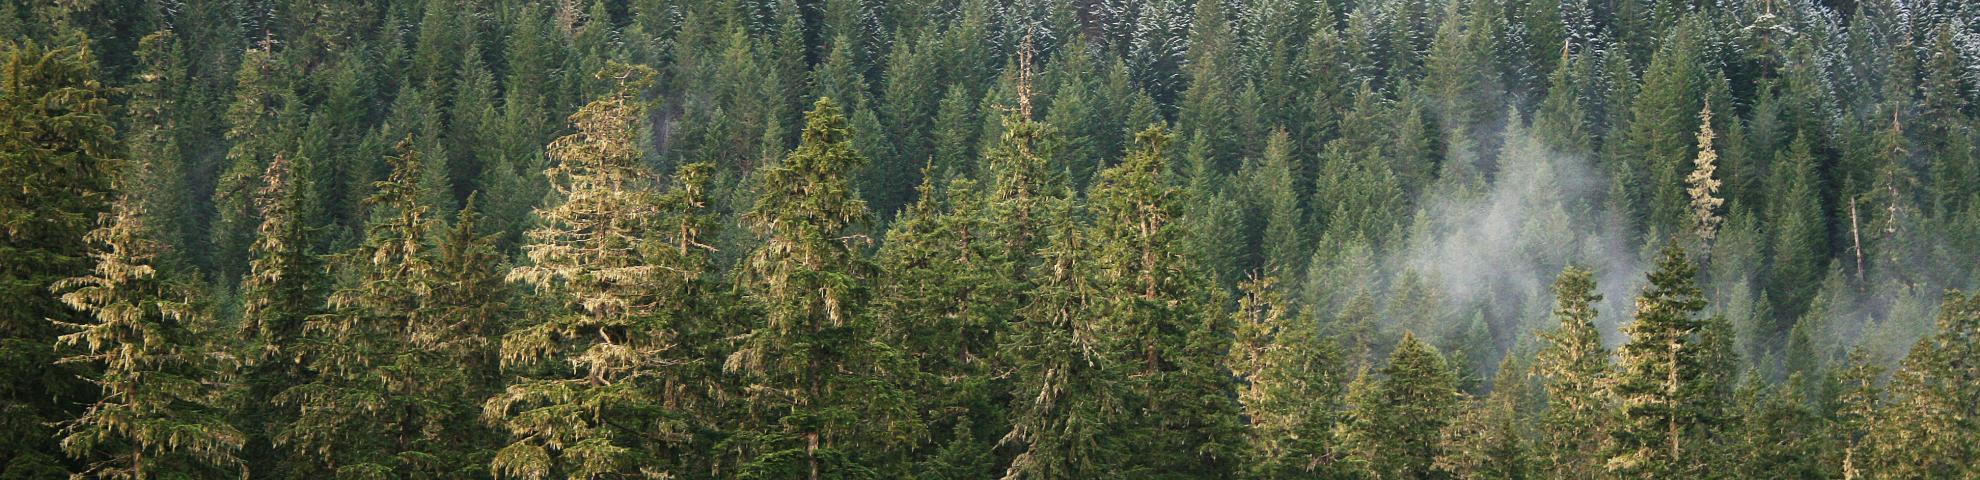 wind river forest dynamics plot